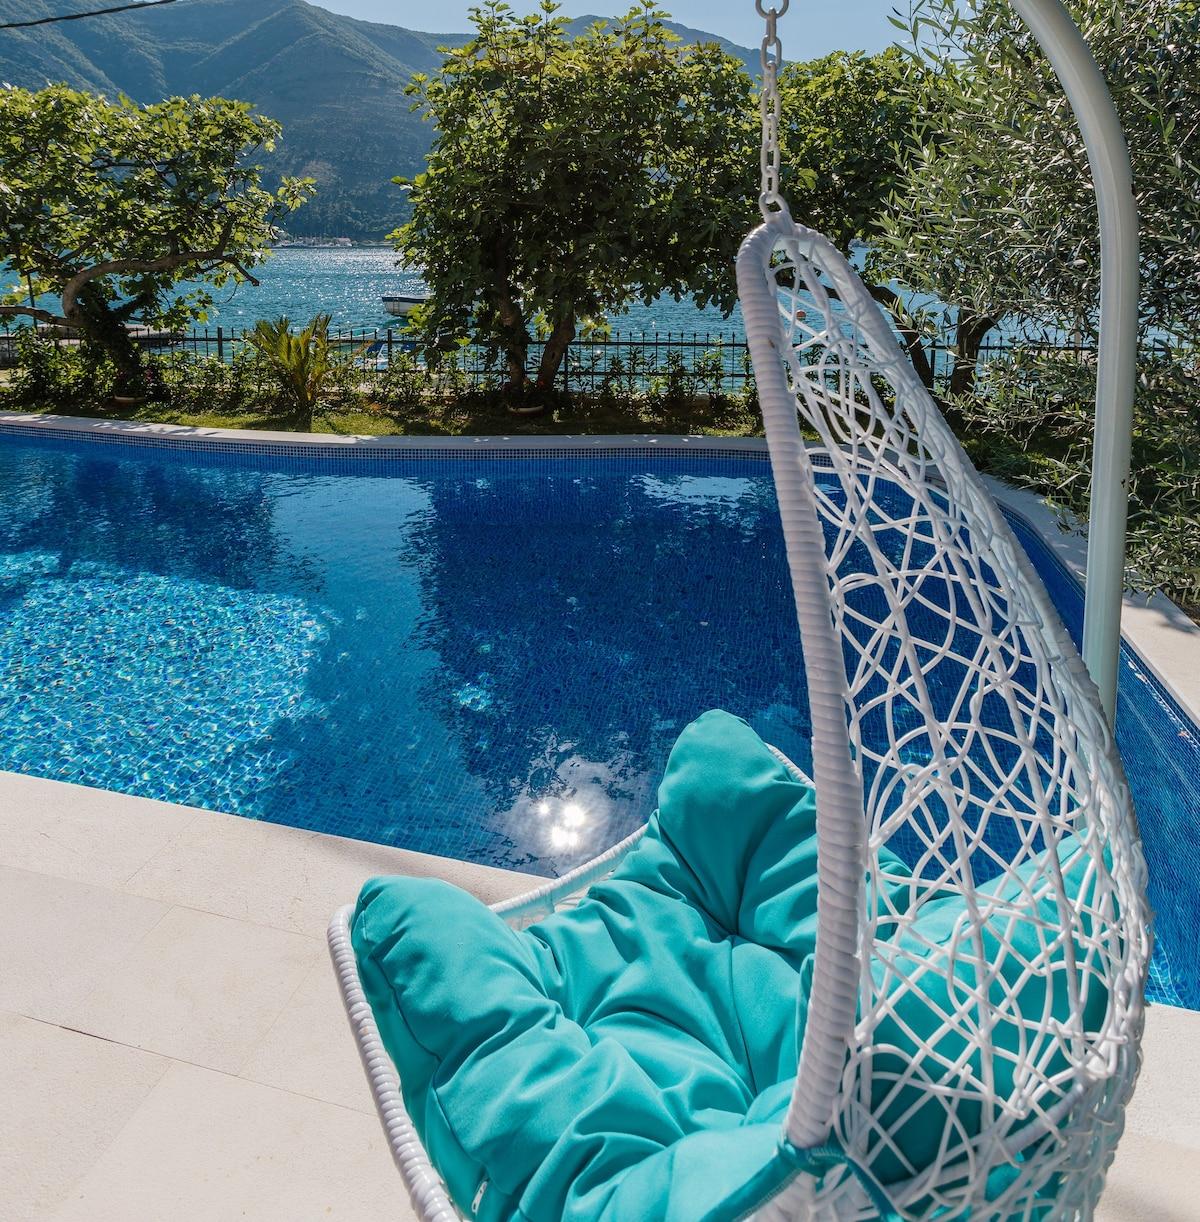 Kotor 2017: 20 Besten Ferienvillen Und Luxusvilla In Kotor   Airbnb Kotor,  Kotor Municipality, Montenegro